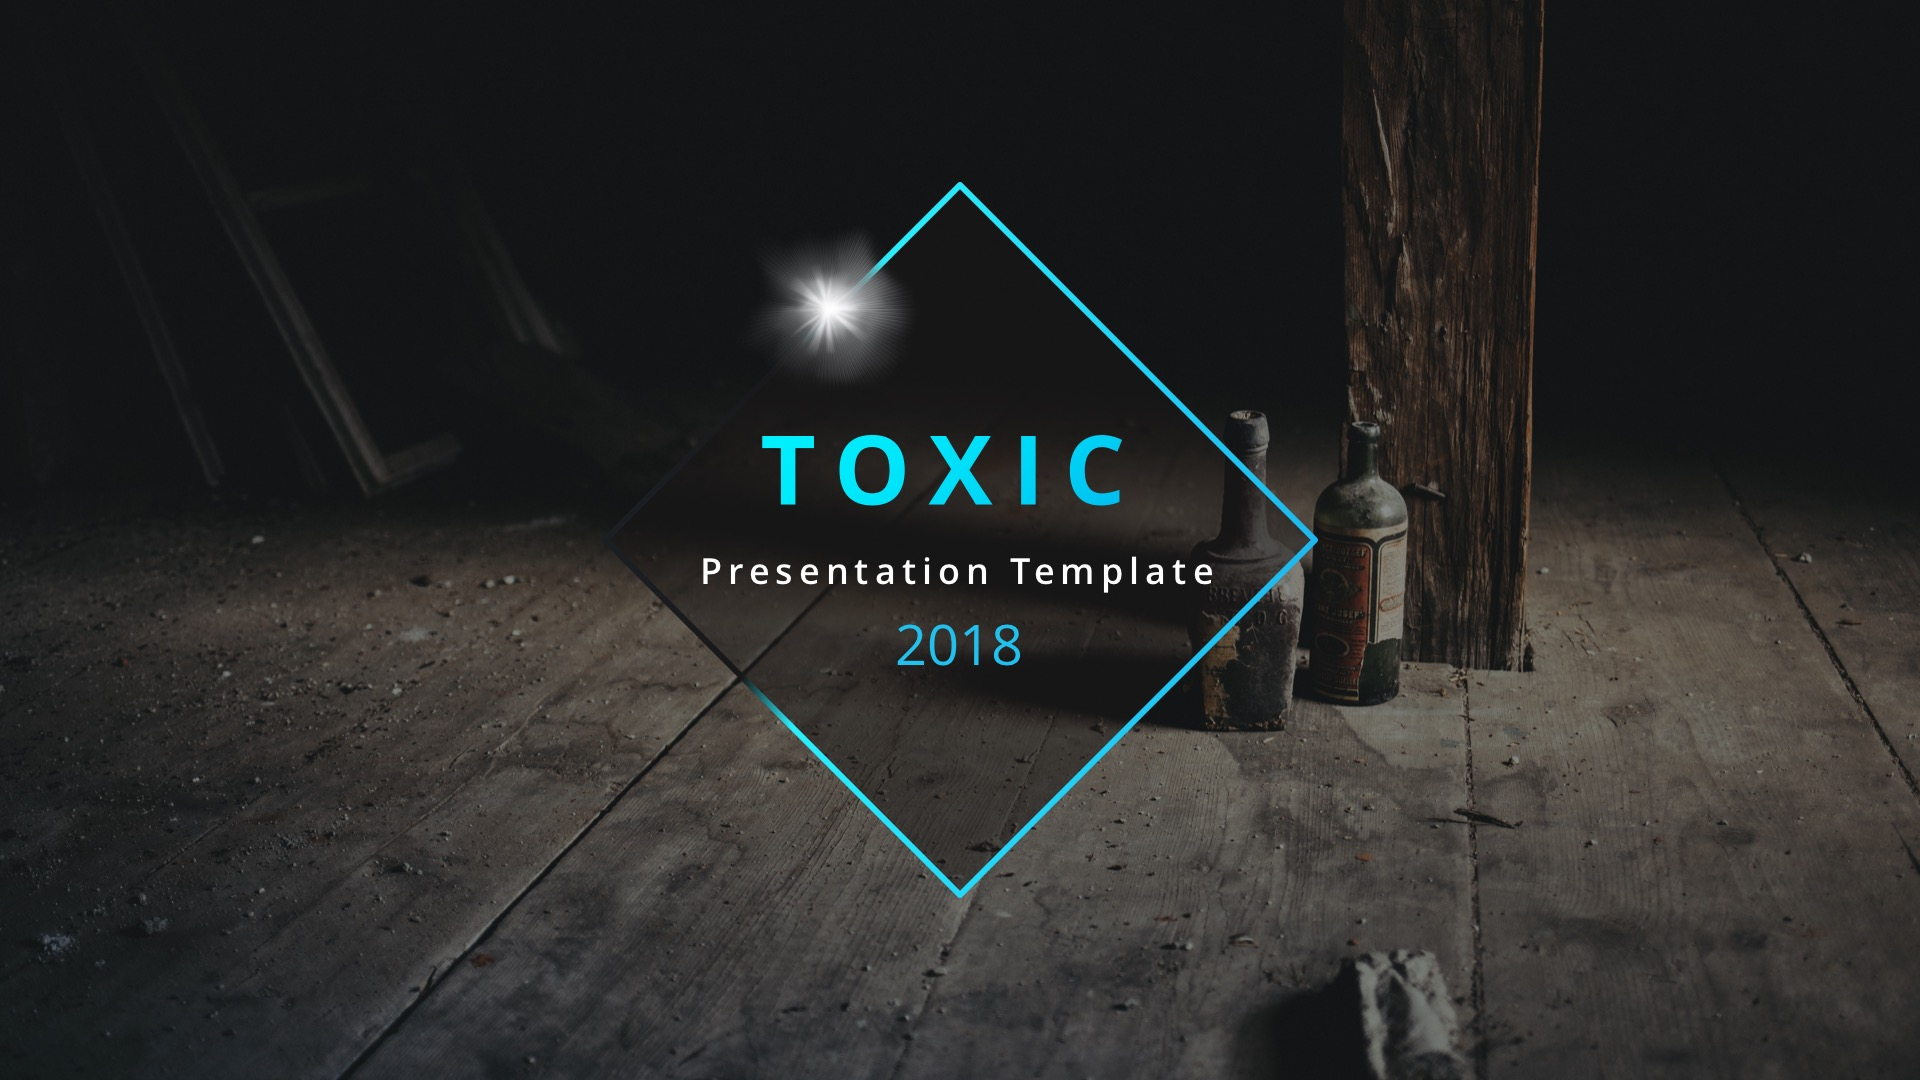 Toxic Creative Google Slide Template by ESTE_Studio   GraphicRiver